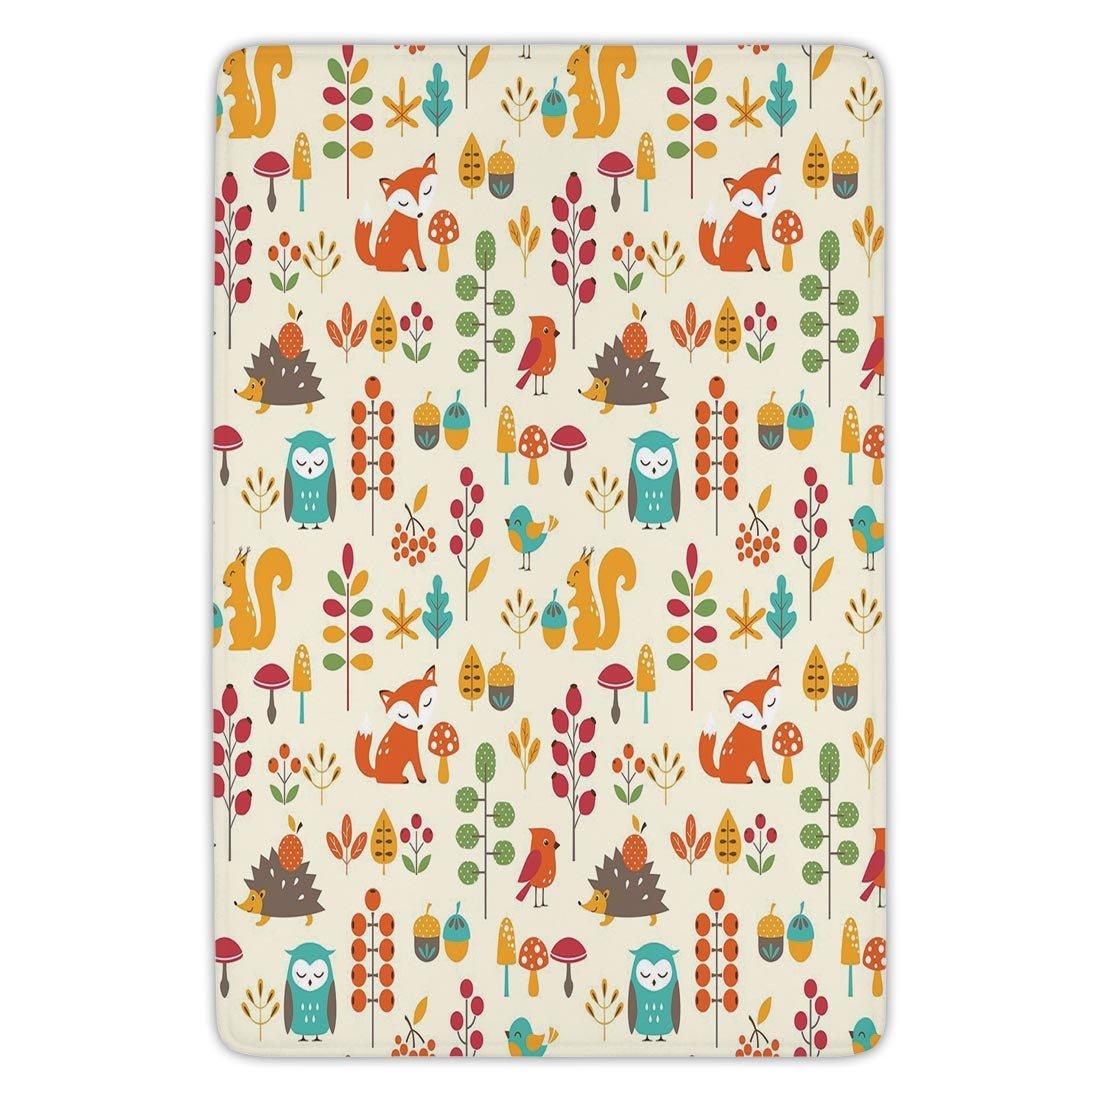 Bathroom Bath Rug Kitchen Floor Mat Carpet,Children,Cute Kids Autumn Pattern with Owl Fox Squirrel Birds Animal Leaves Artsy Print,Multicolor,Flannel Microfiber Non-slip Soft Absorbent